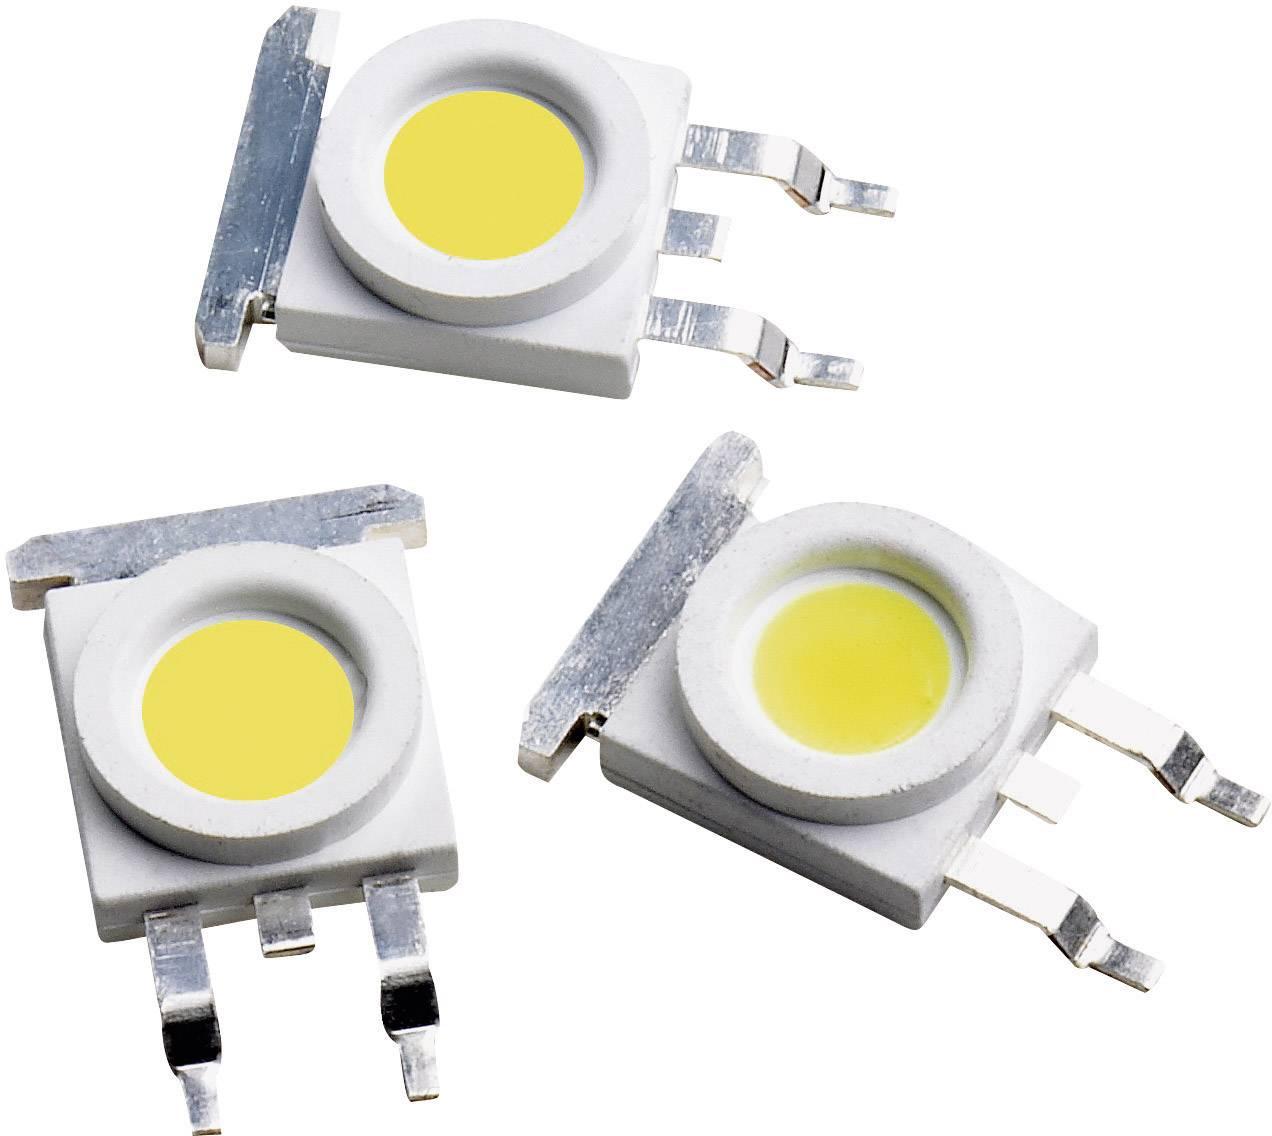 HighPower LED ASMT-MW01-NFH00 1 W 105 lm 3.2 V 350 mA studená bílá